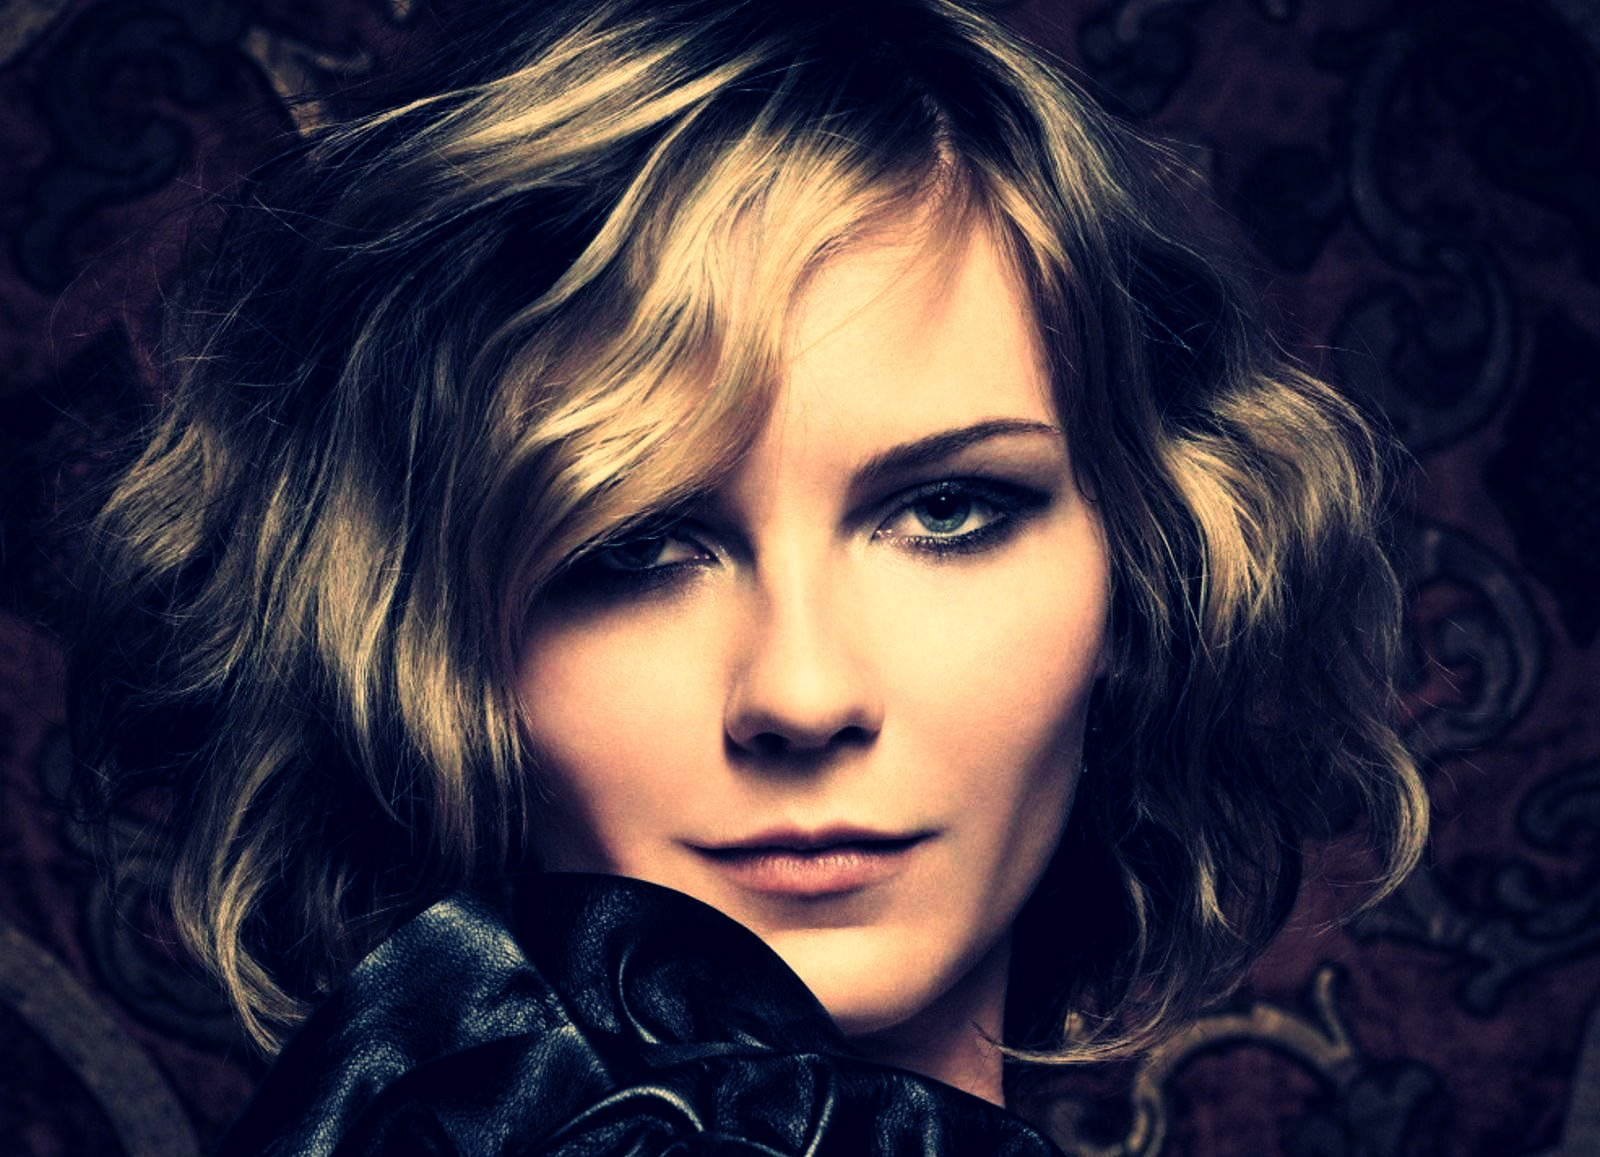 beautiful female celebrities wallpapers - photo #9